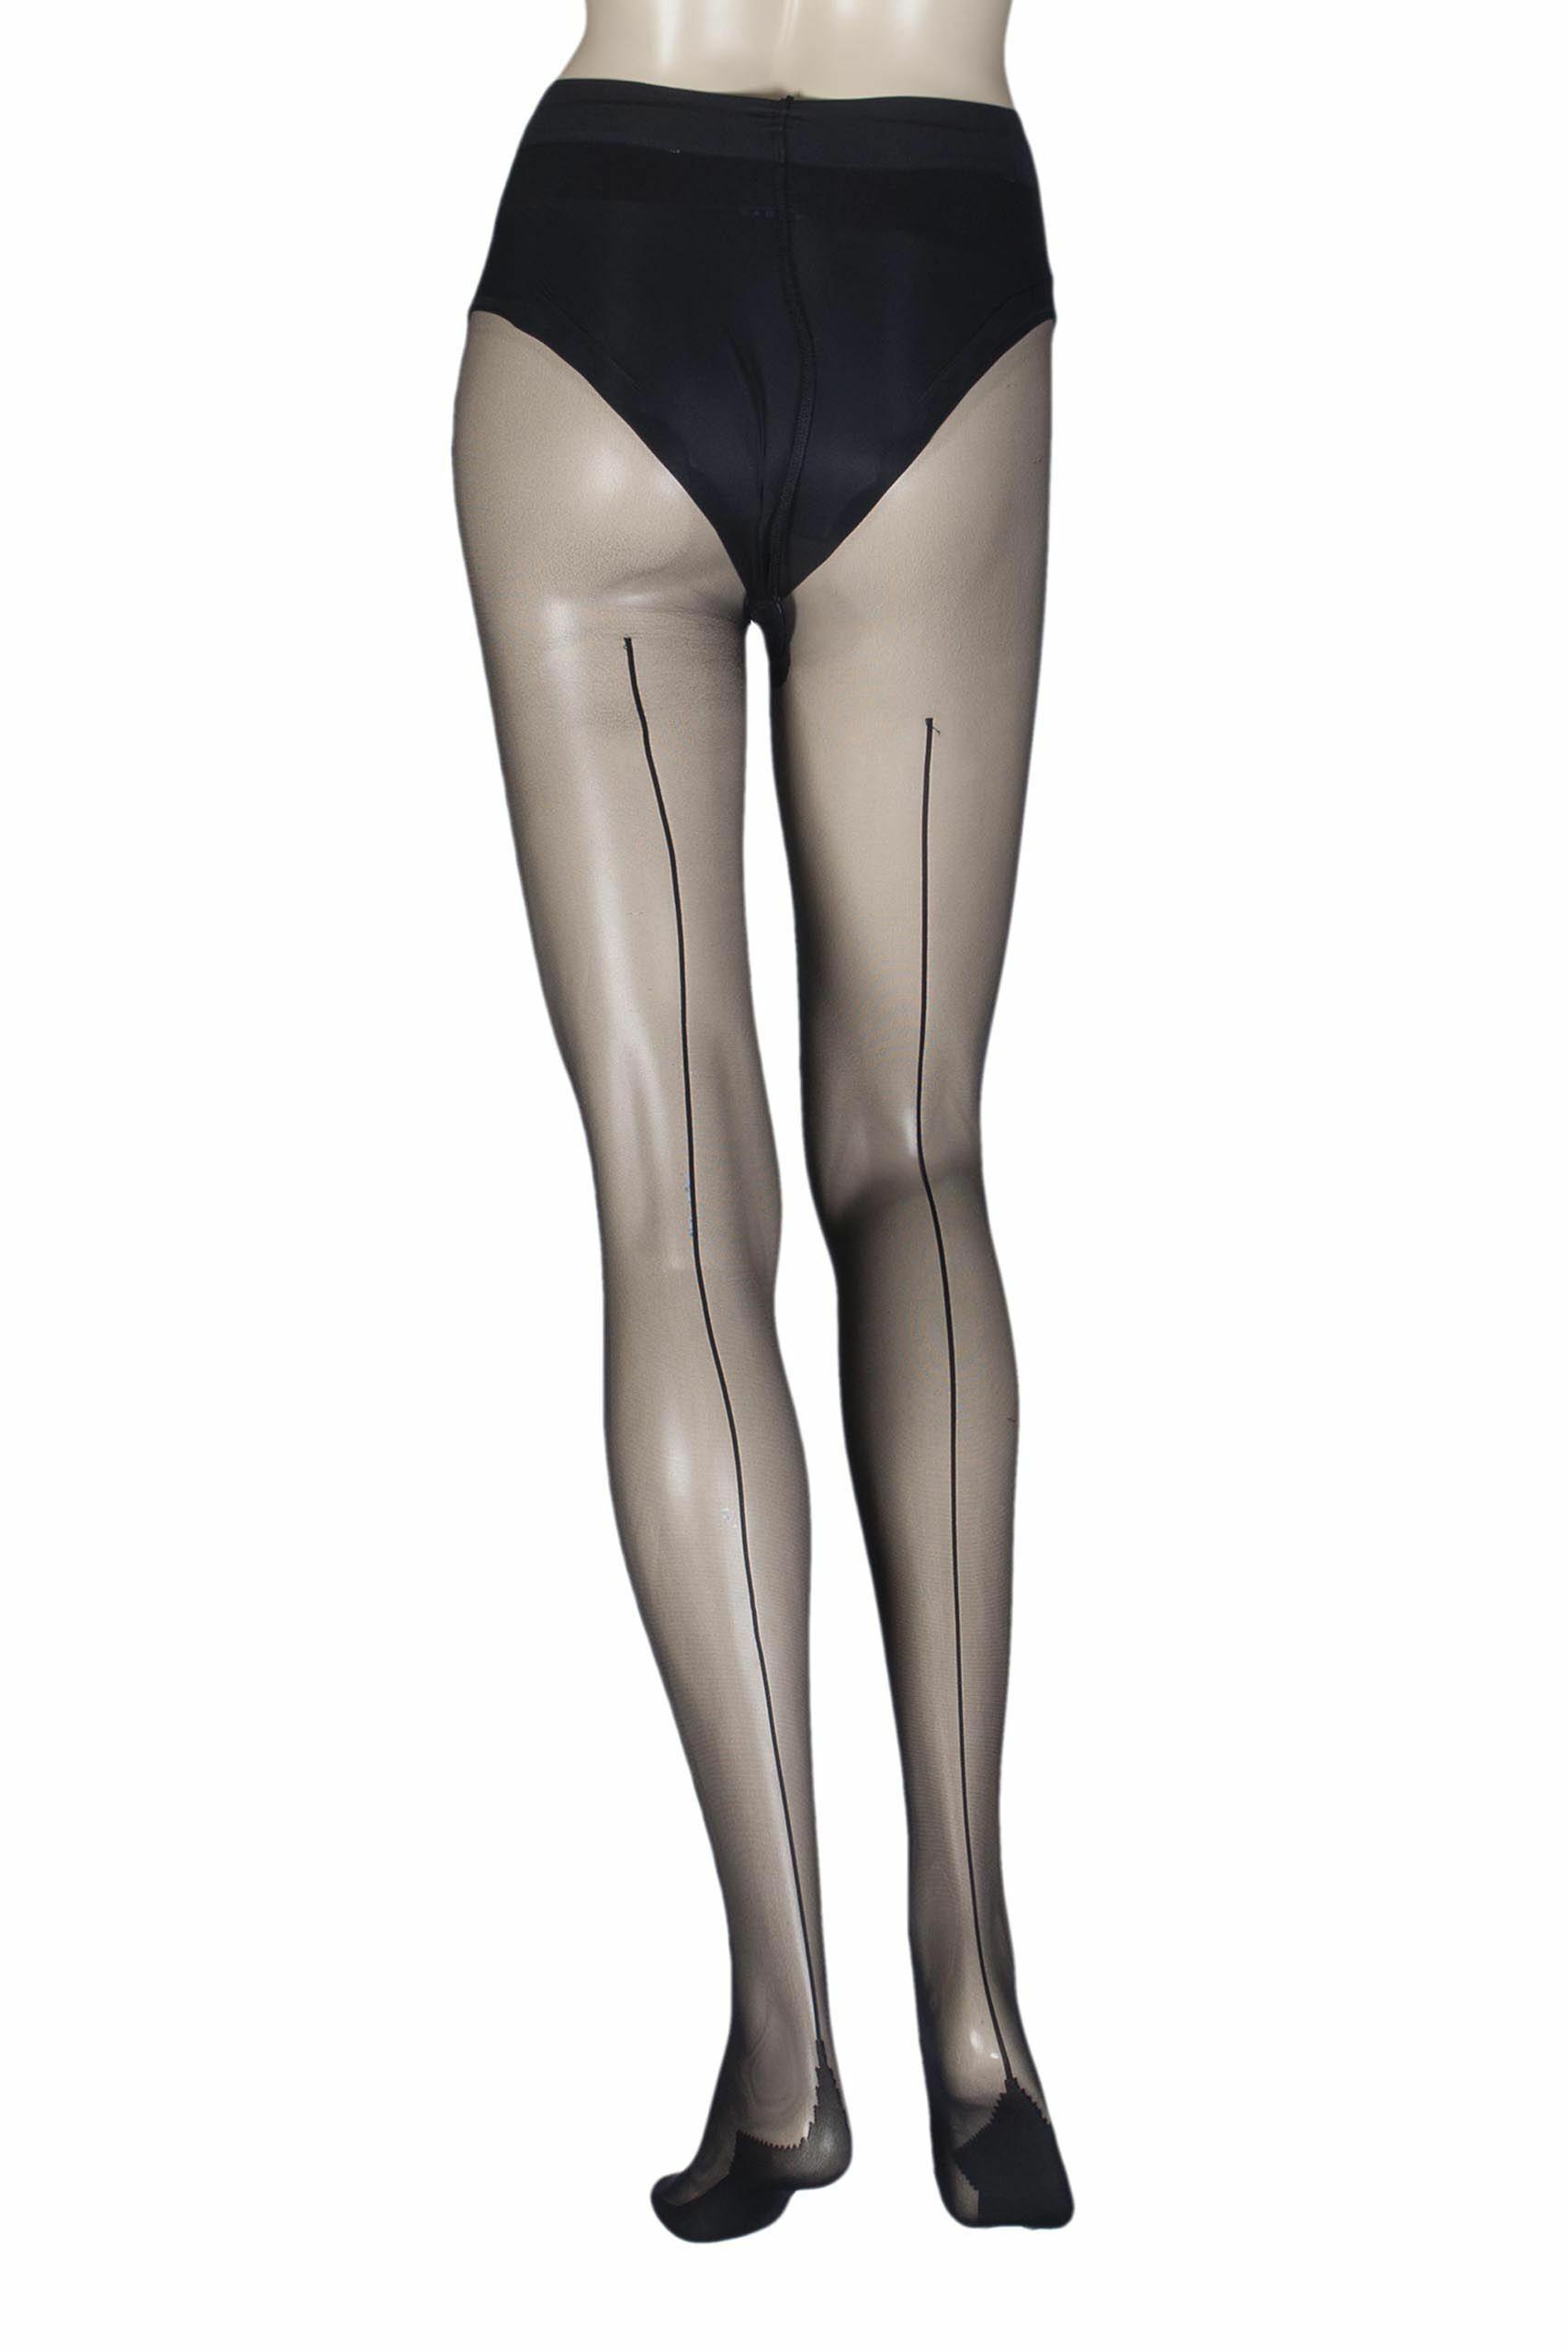 Image of 1 Pair Black Ultimate Sexy Sheer Back Seam Tights Ladies Large - Calvin Klein